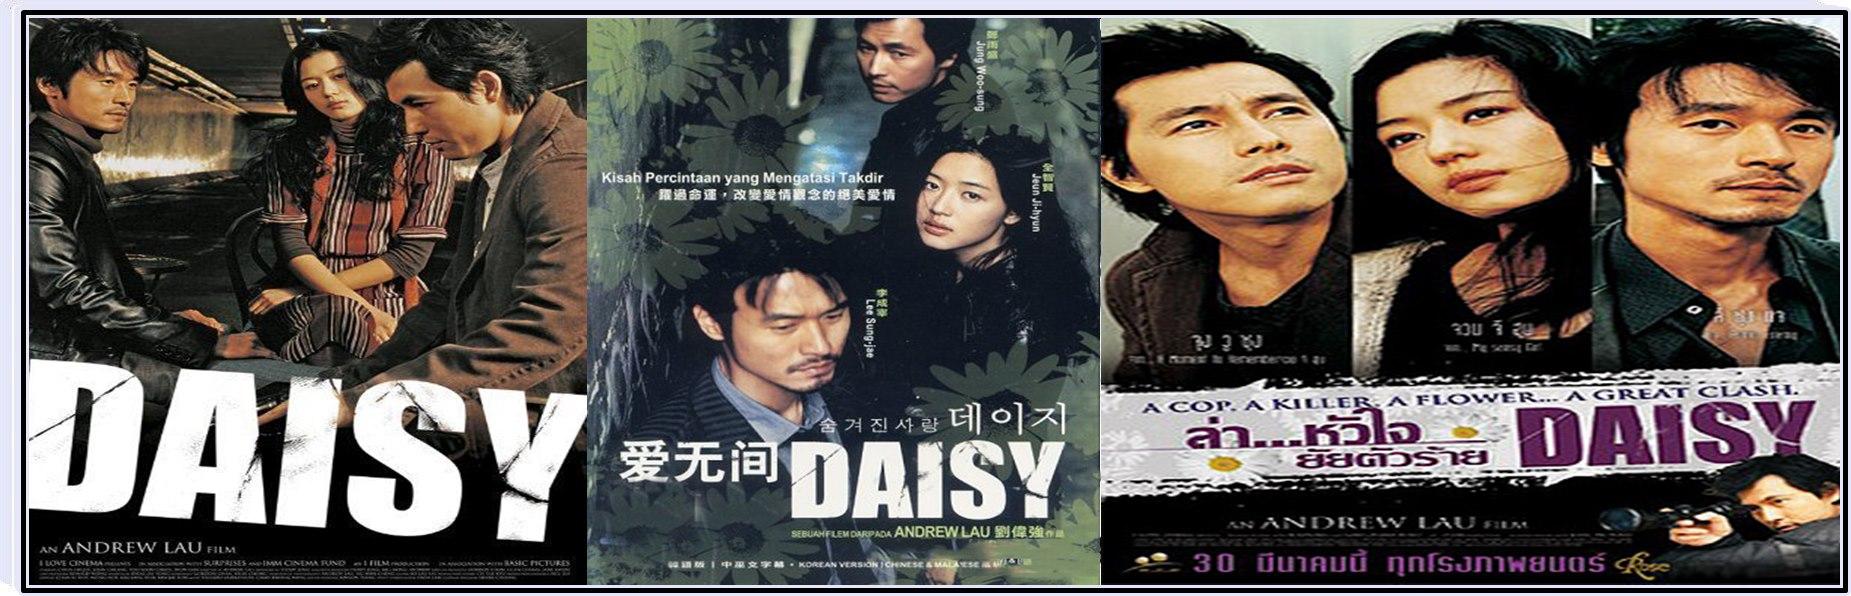 Deiji/Daisy 2006 Full Movie Korean 720p - 480p ORG BRRip 300MB - 850MB ESubs Free Download